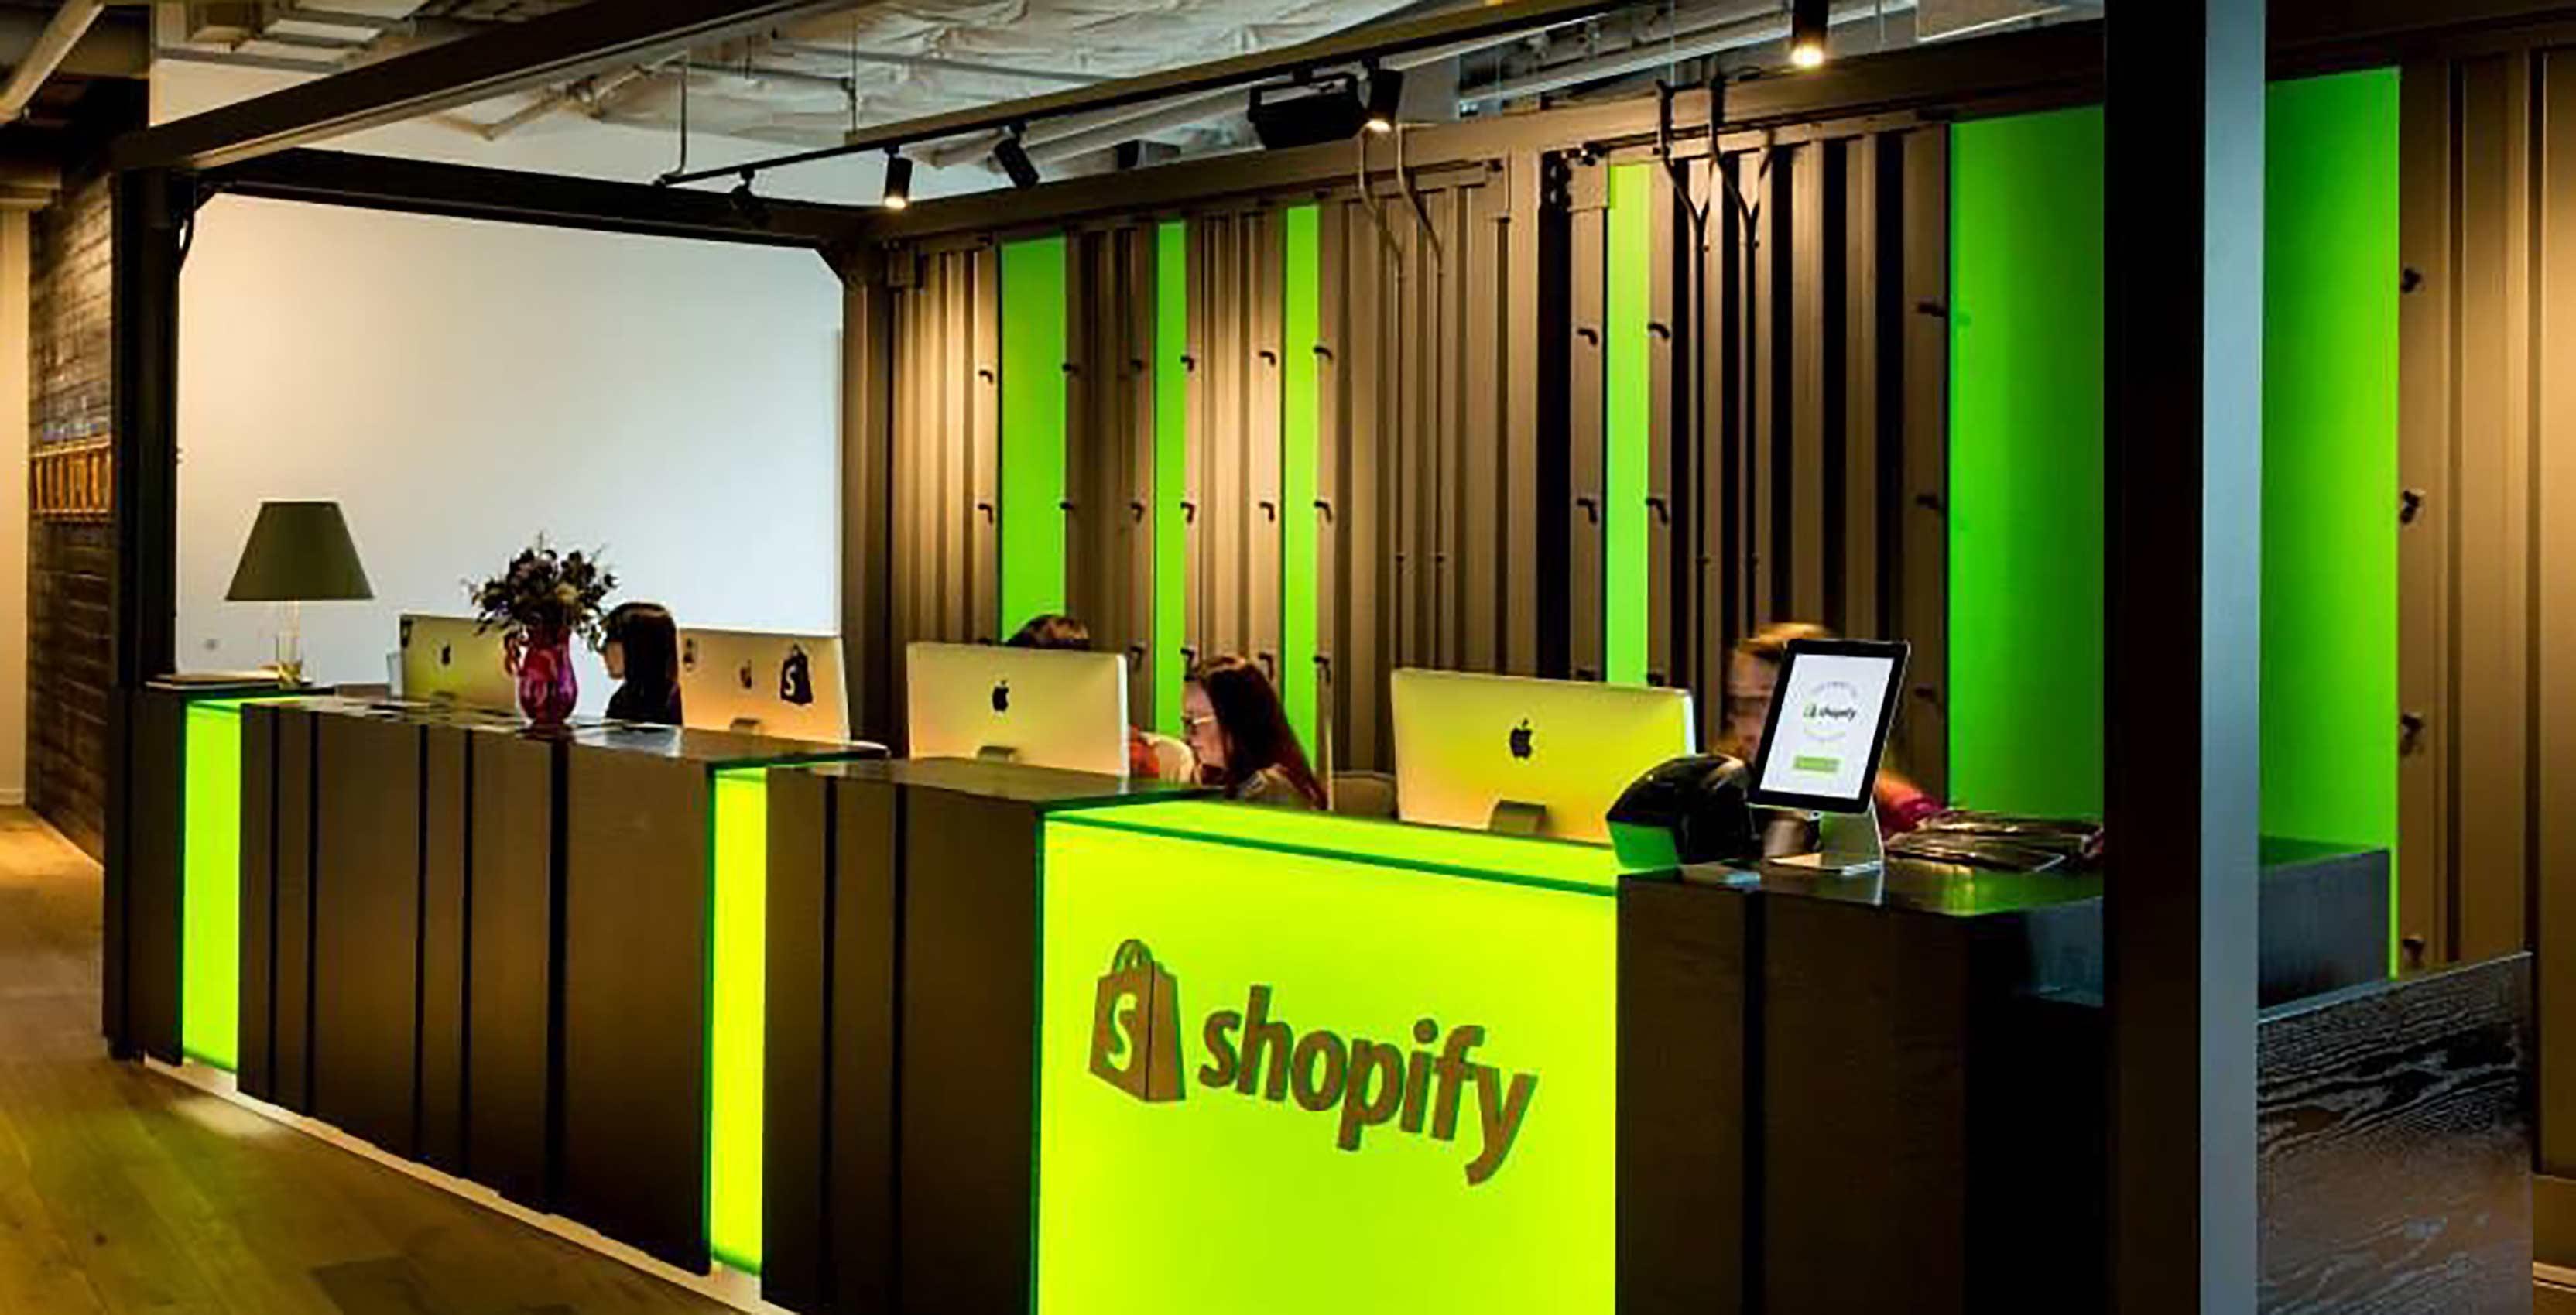 Shopify desk